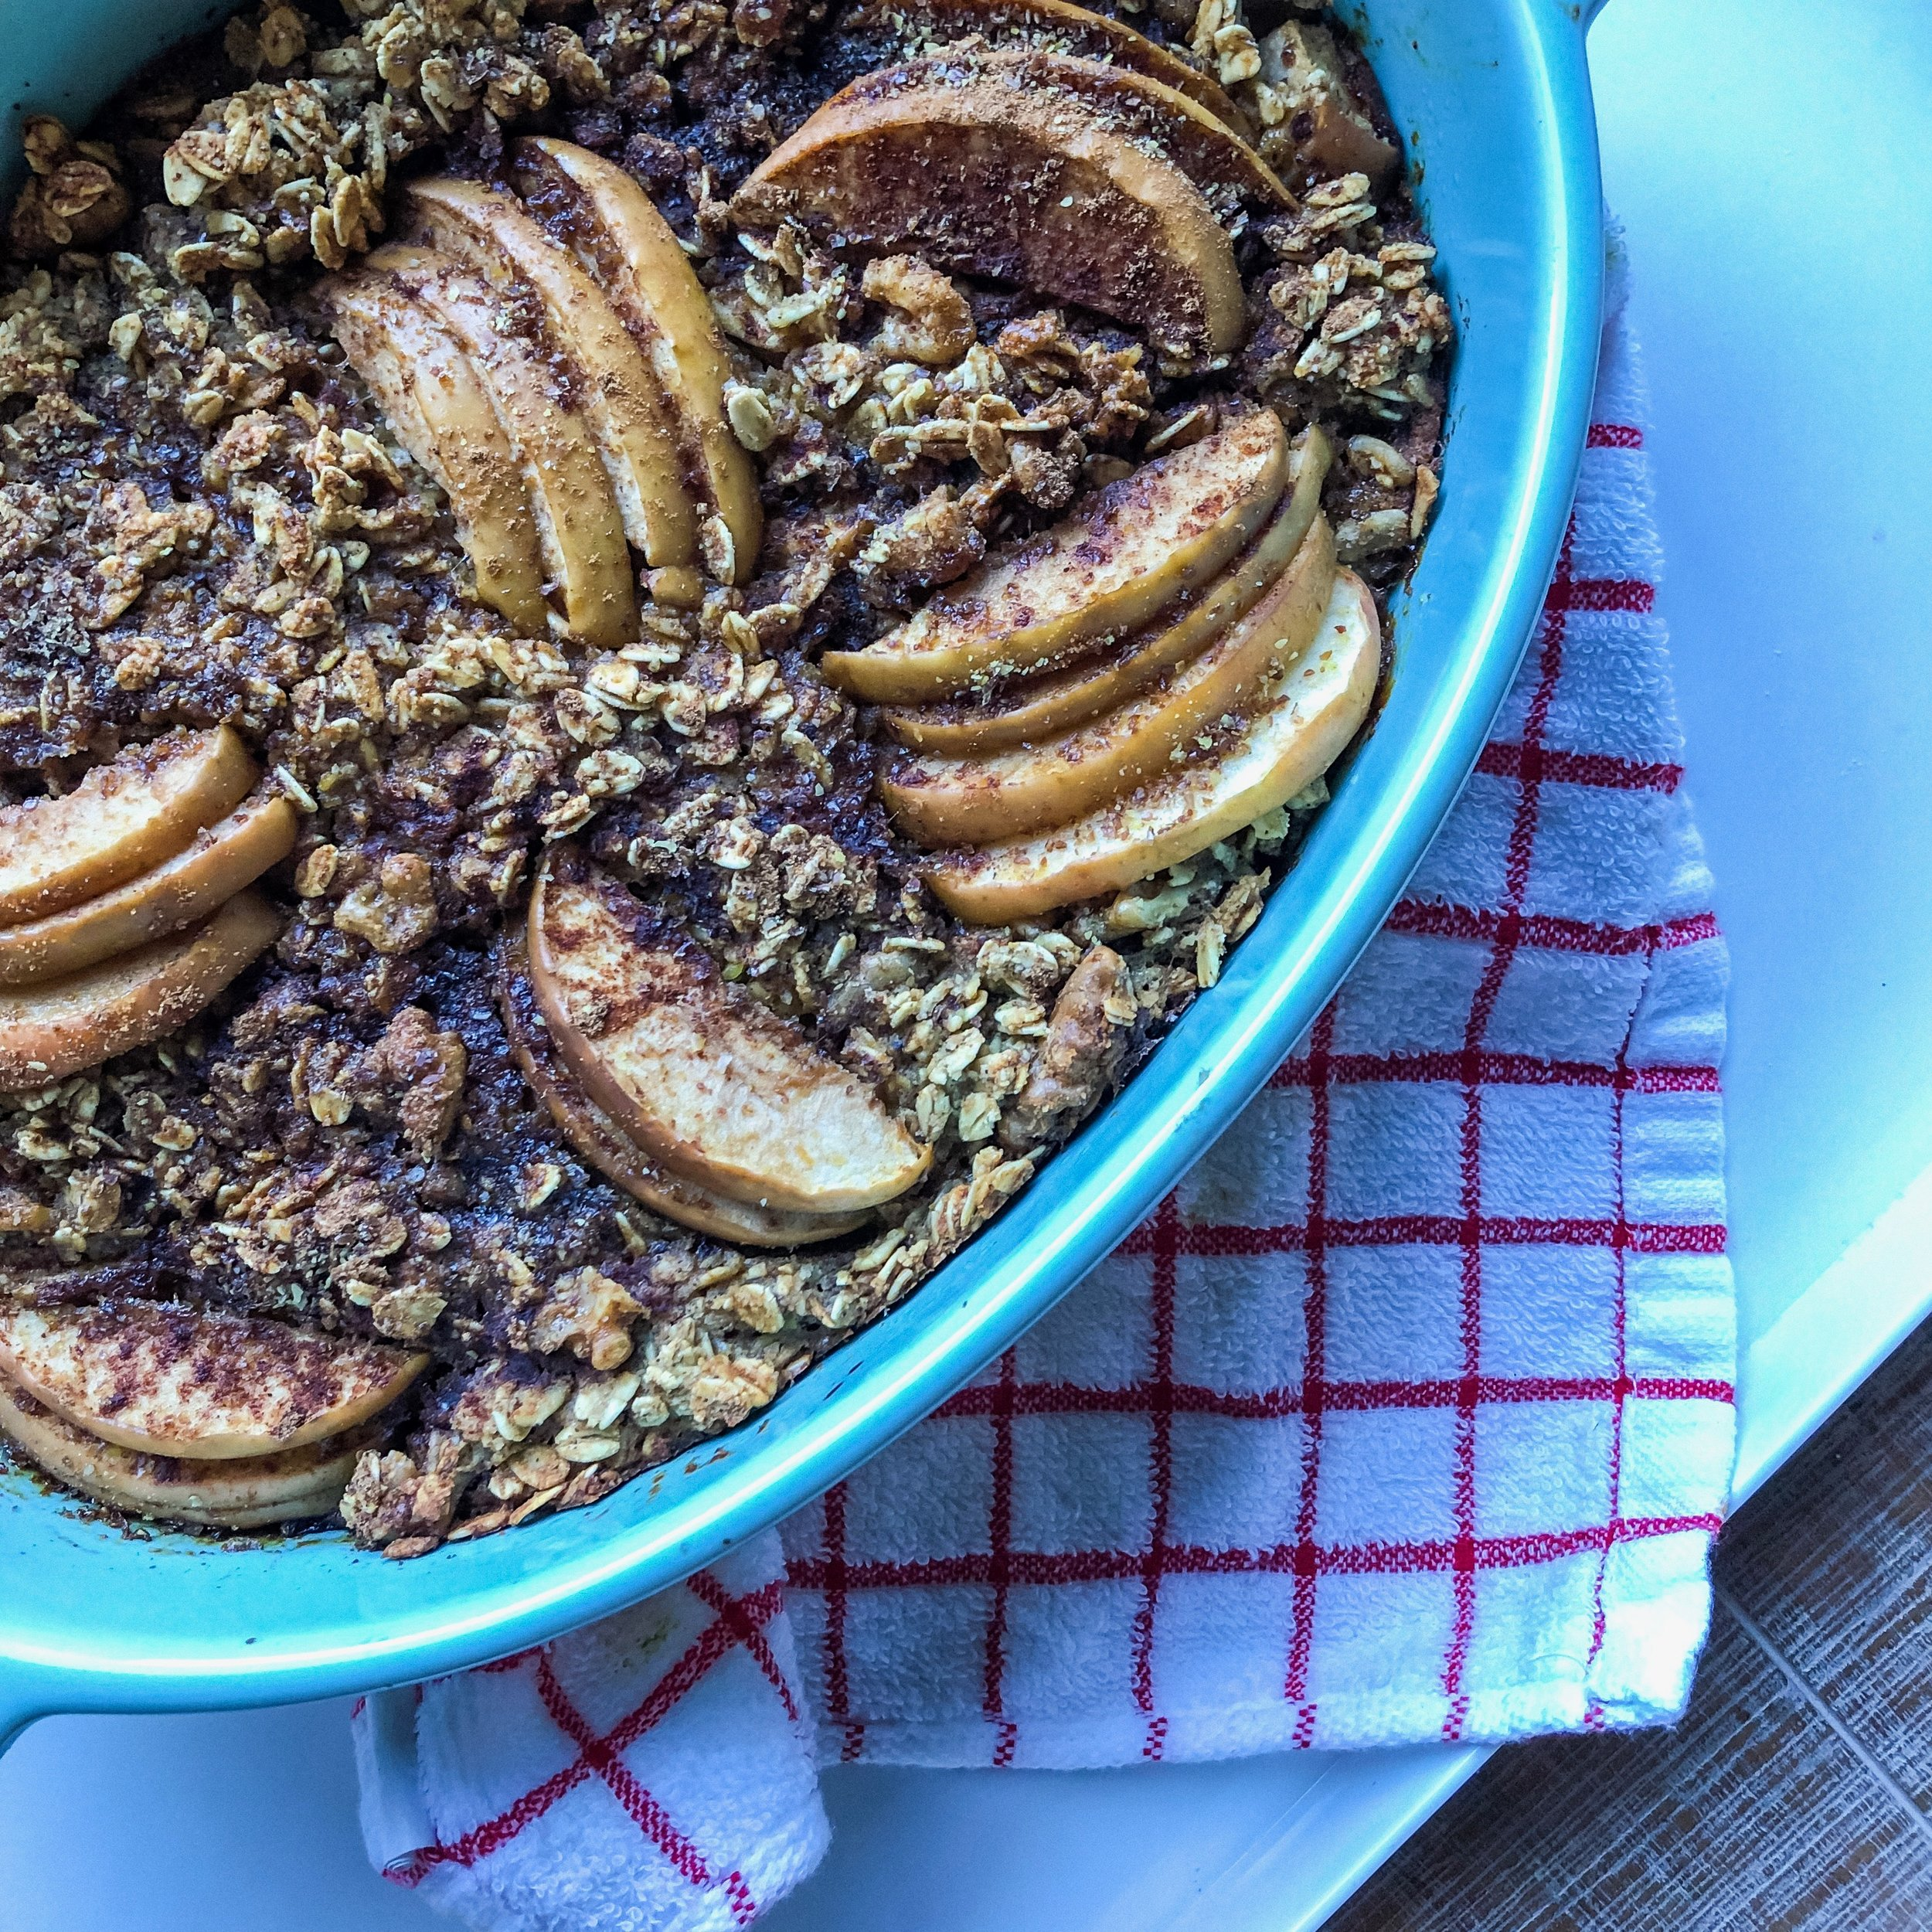 Apple Pie Baked Oats - Gluten-Free (optional), Vegan (Optional), Meal Prep, Superfoods